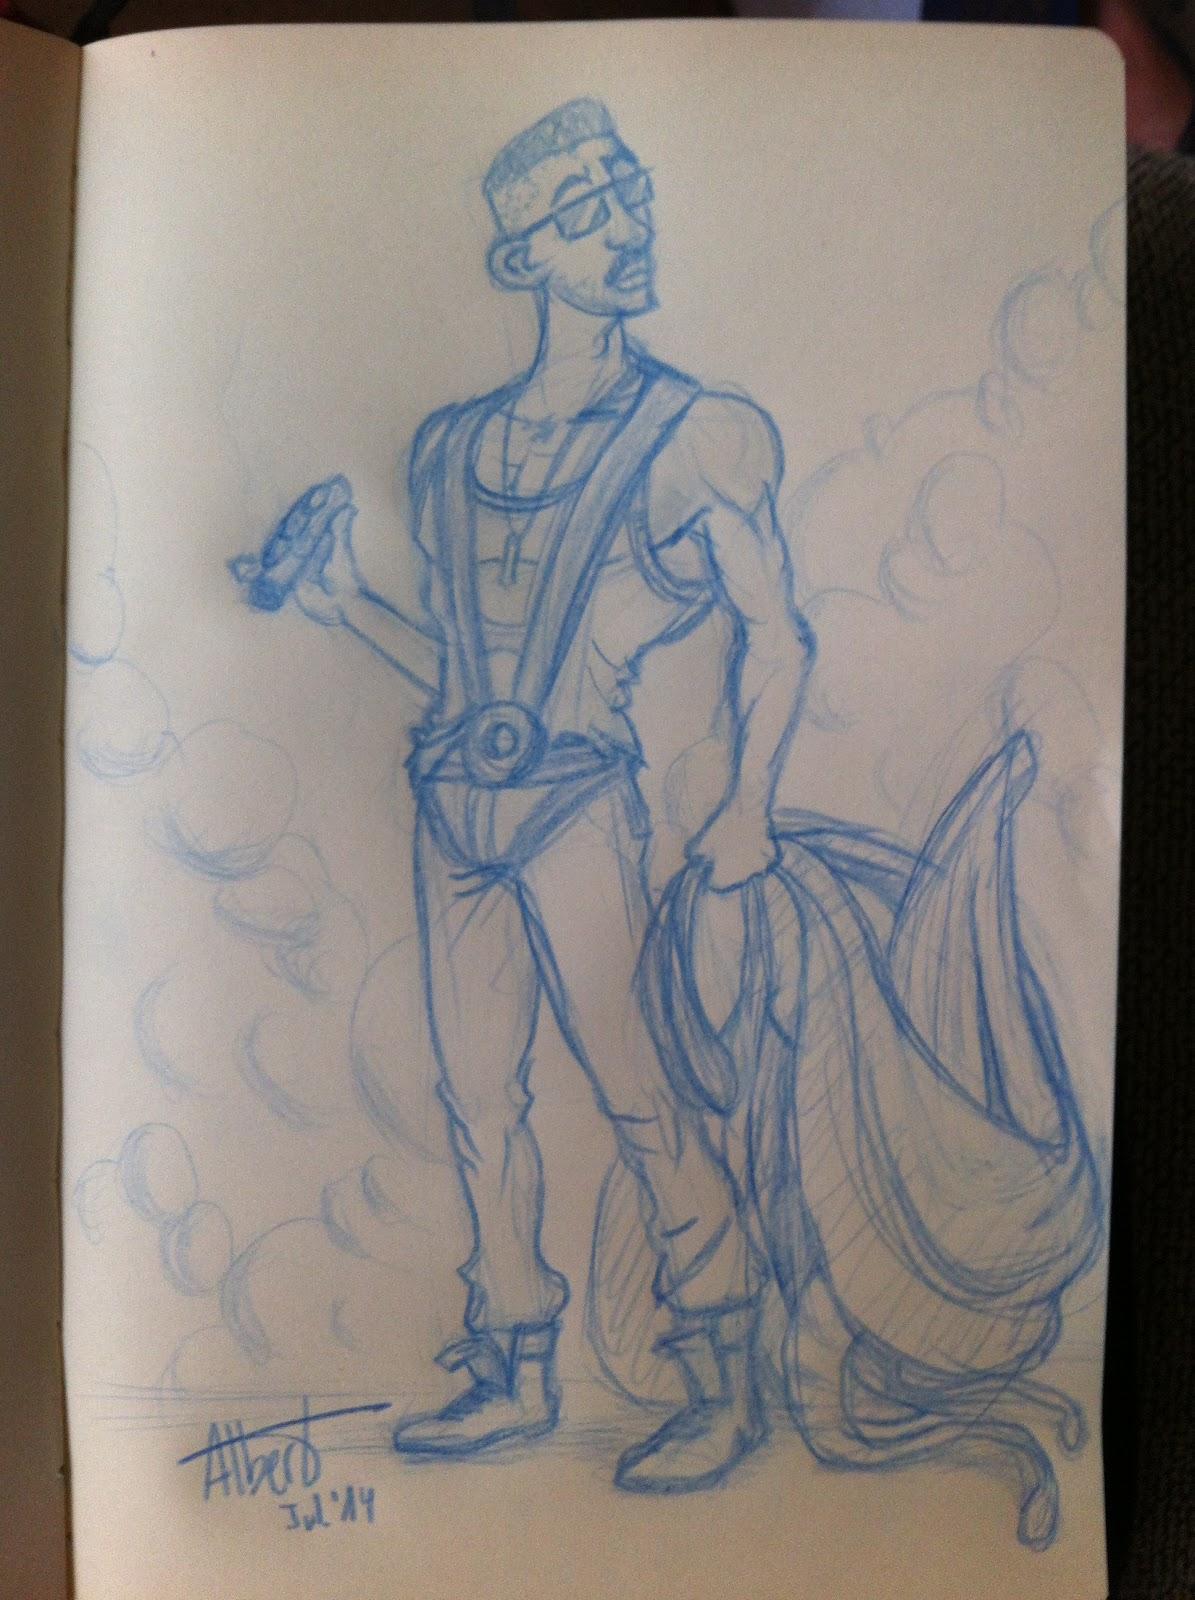 'Capt. Hiller for Sketch_Dailies'' - Albert Casado (nfok-e)